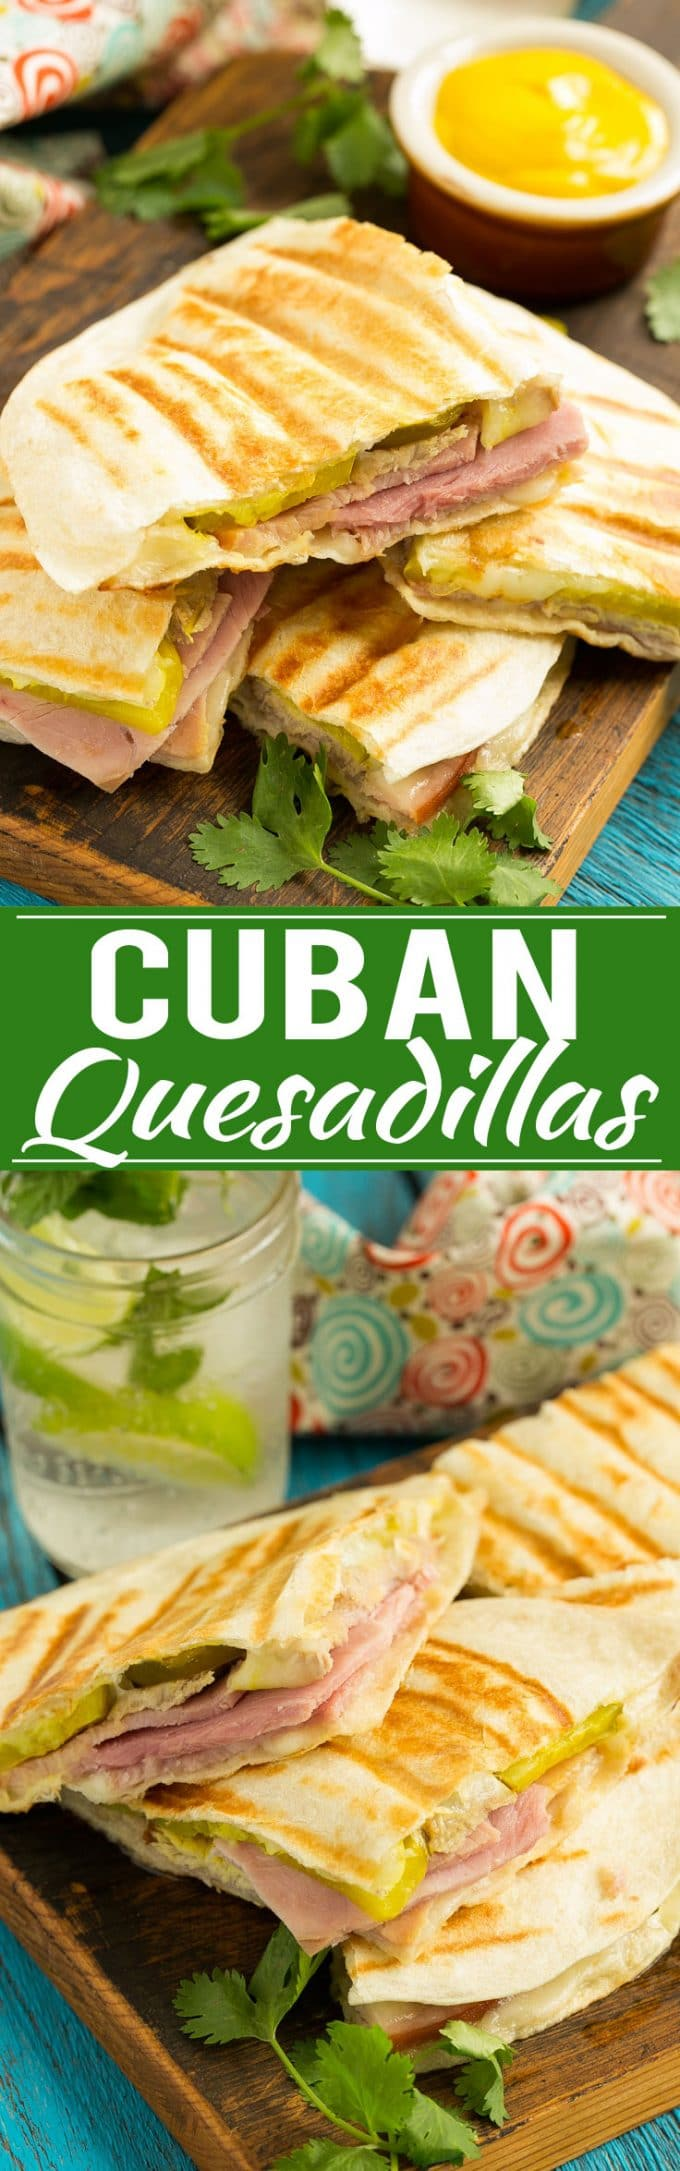 Cuban Quesadillas Recipe | Cuban Sandwich Quesadilla | Easy Cuban Quesadilla | Best Cuban Sandwich Quesadilla